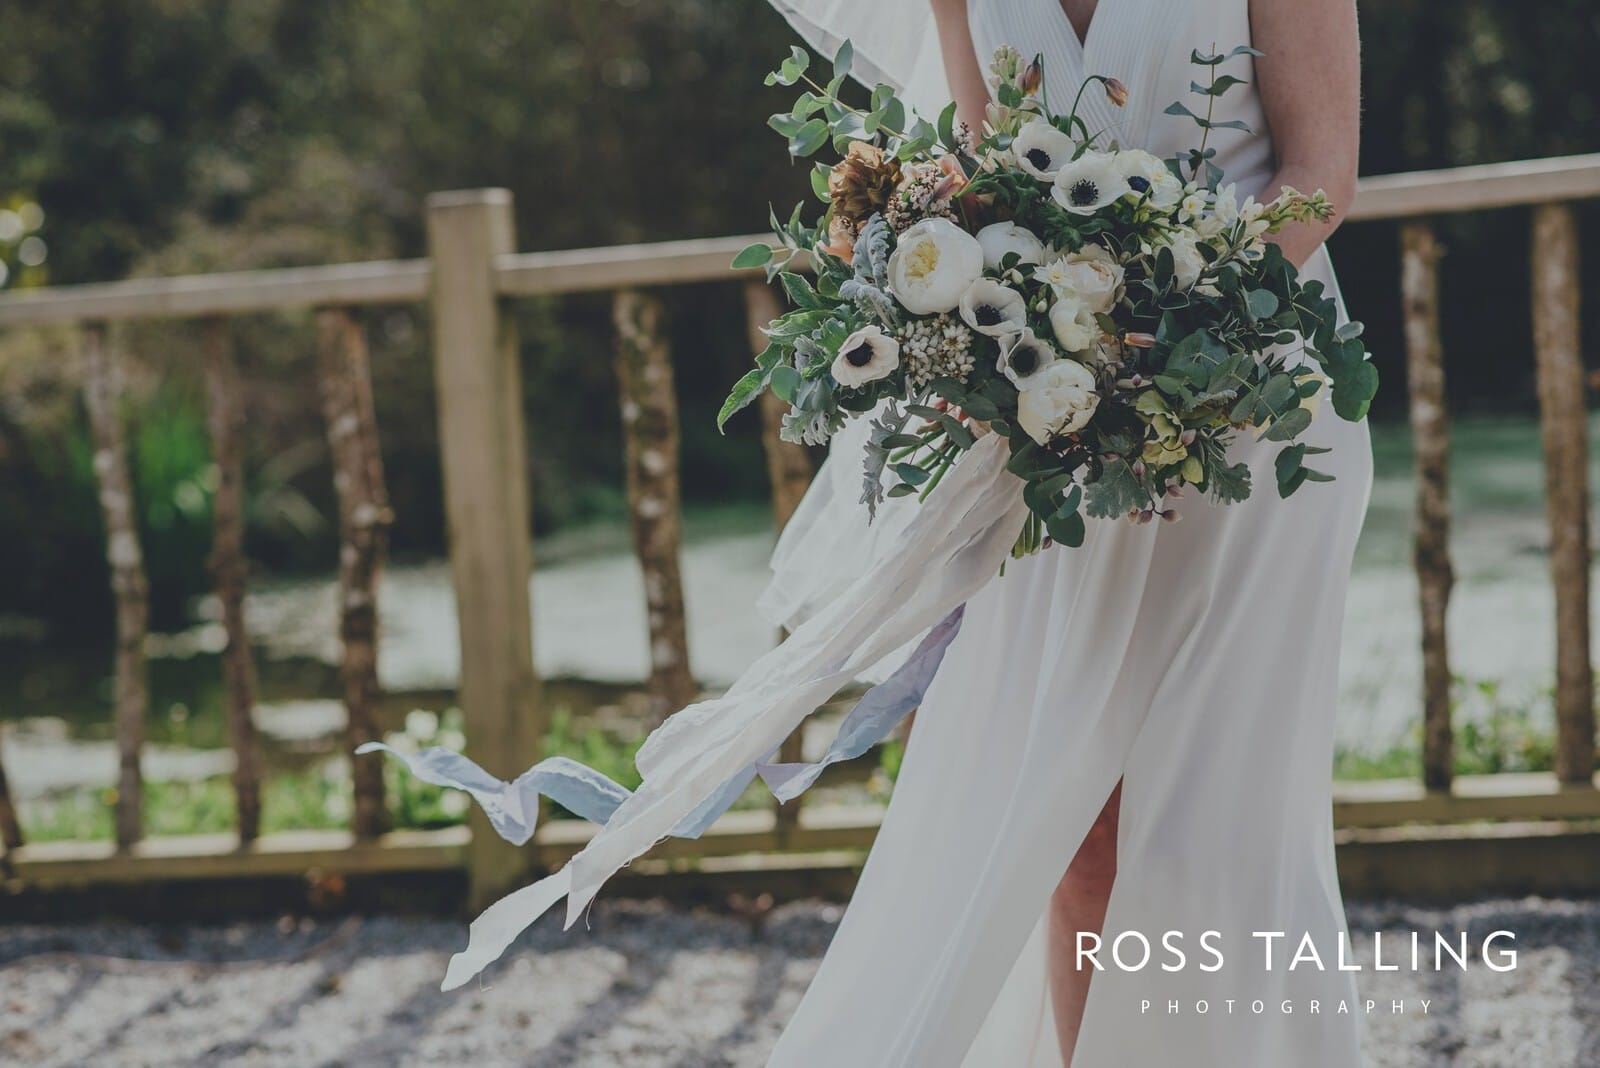 Bonnie & James' Nancarrow Farm Wedding Photography